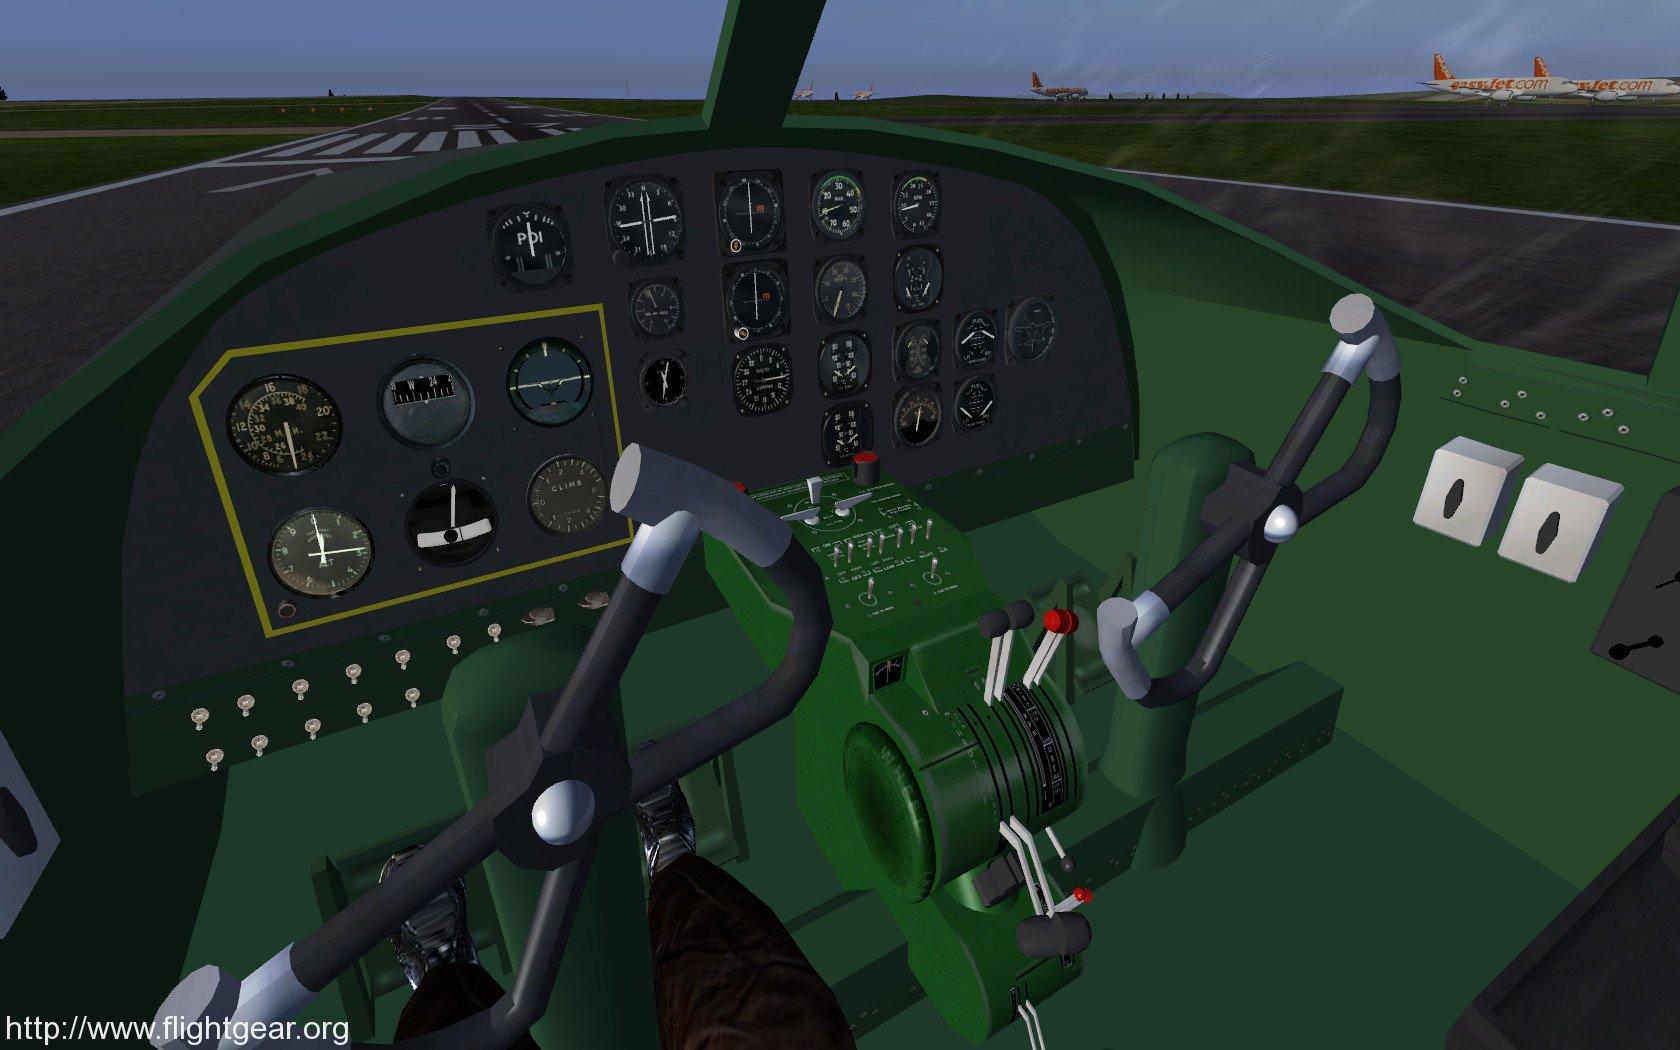 fgfs-screen-180